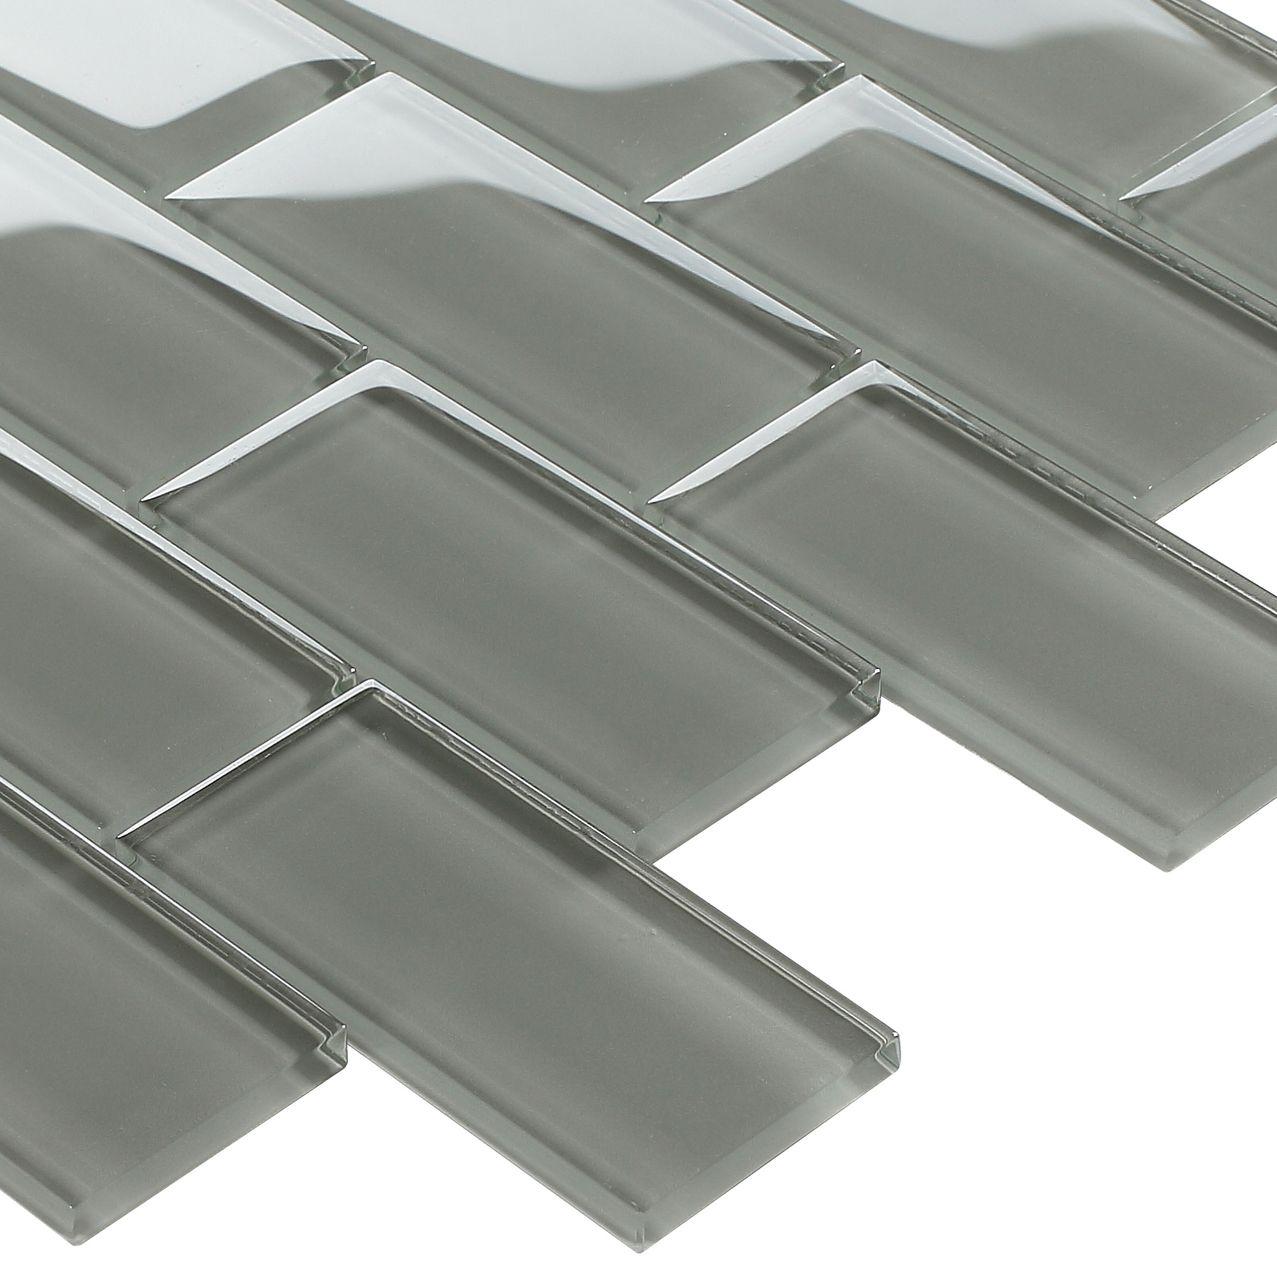 Subway Glass Tile Smoke Grey 2x4 Bathroom Wallsmall